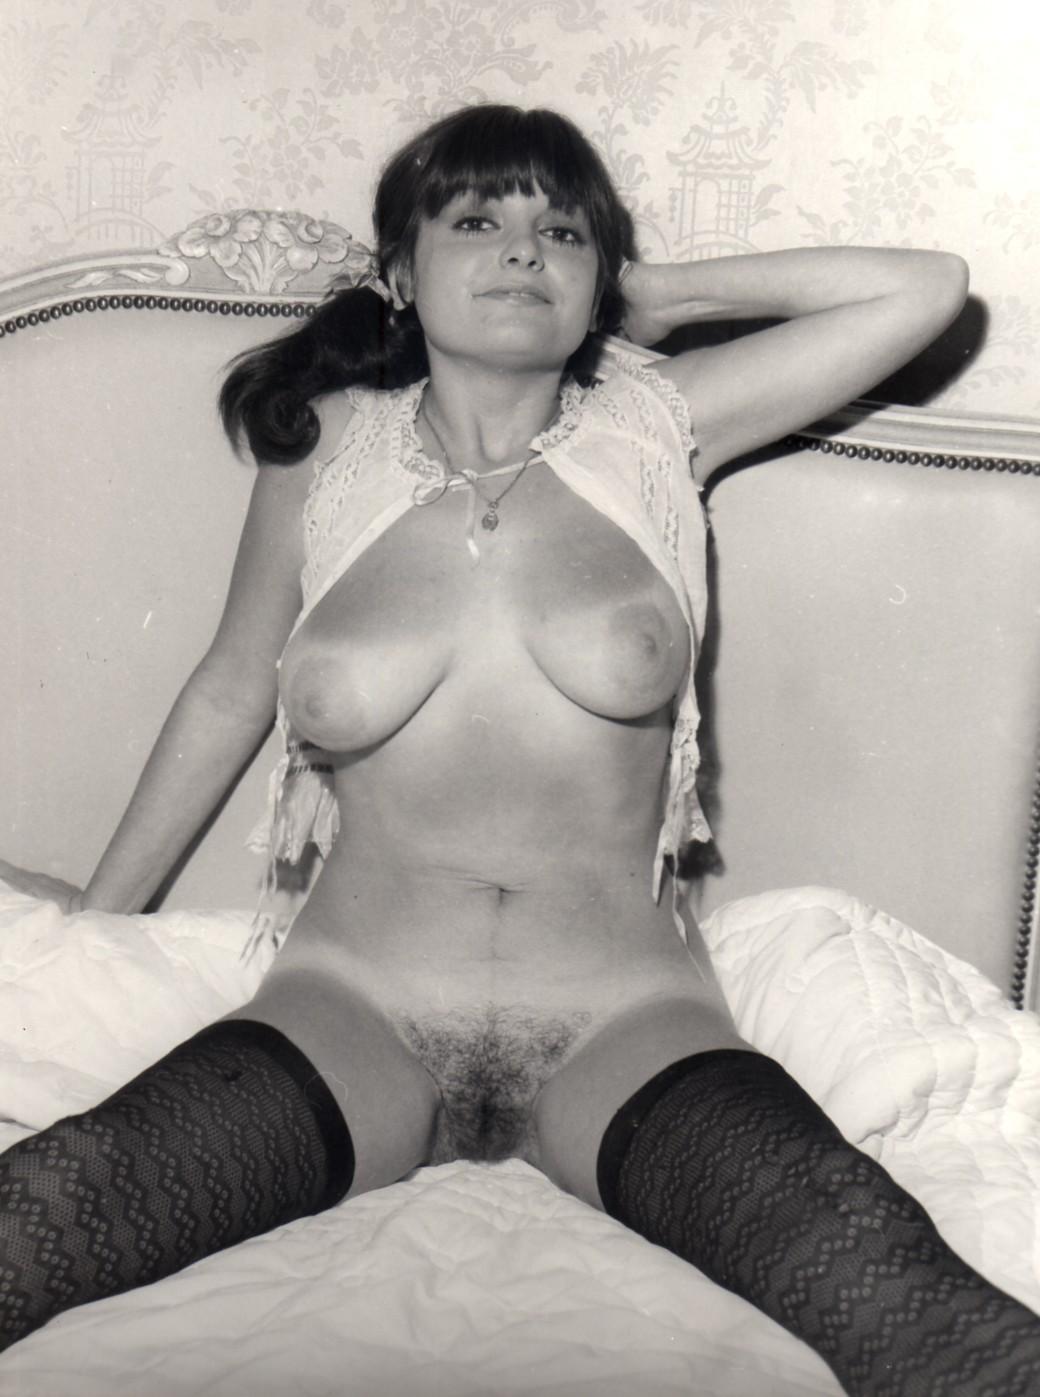 erotique vintage vivastreet arles